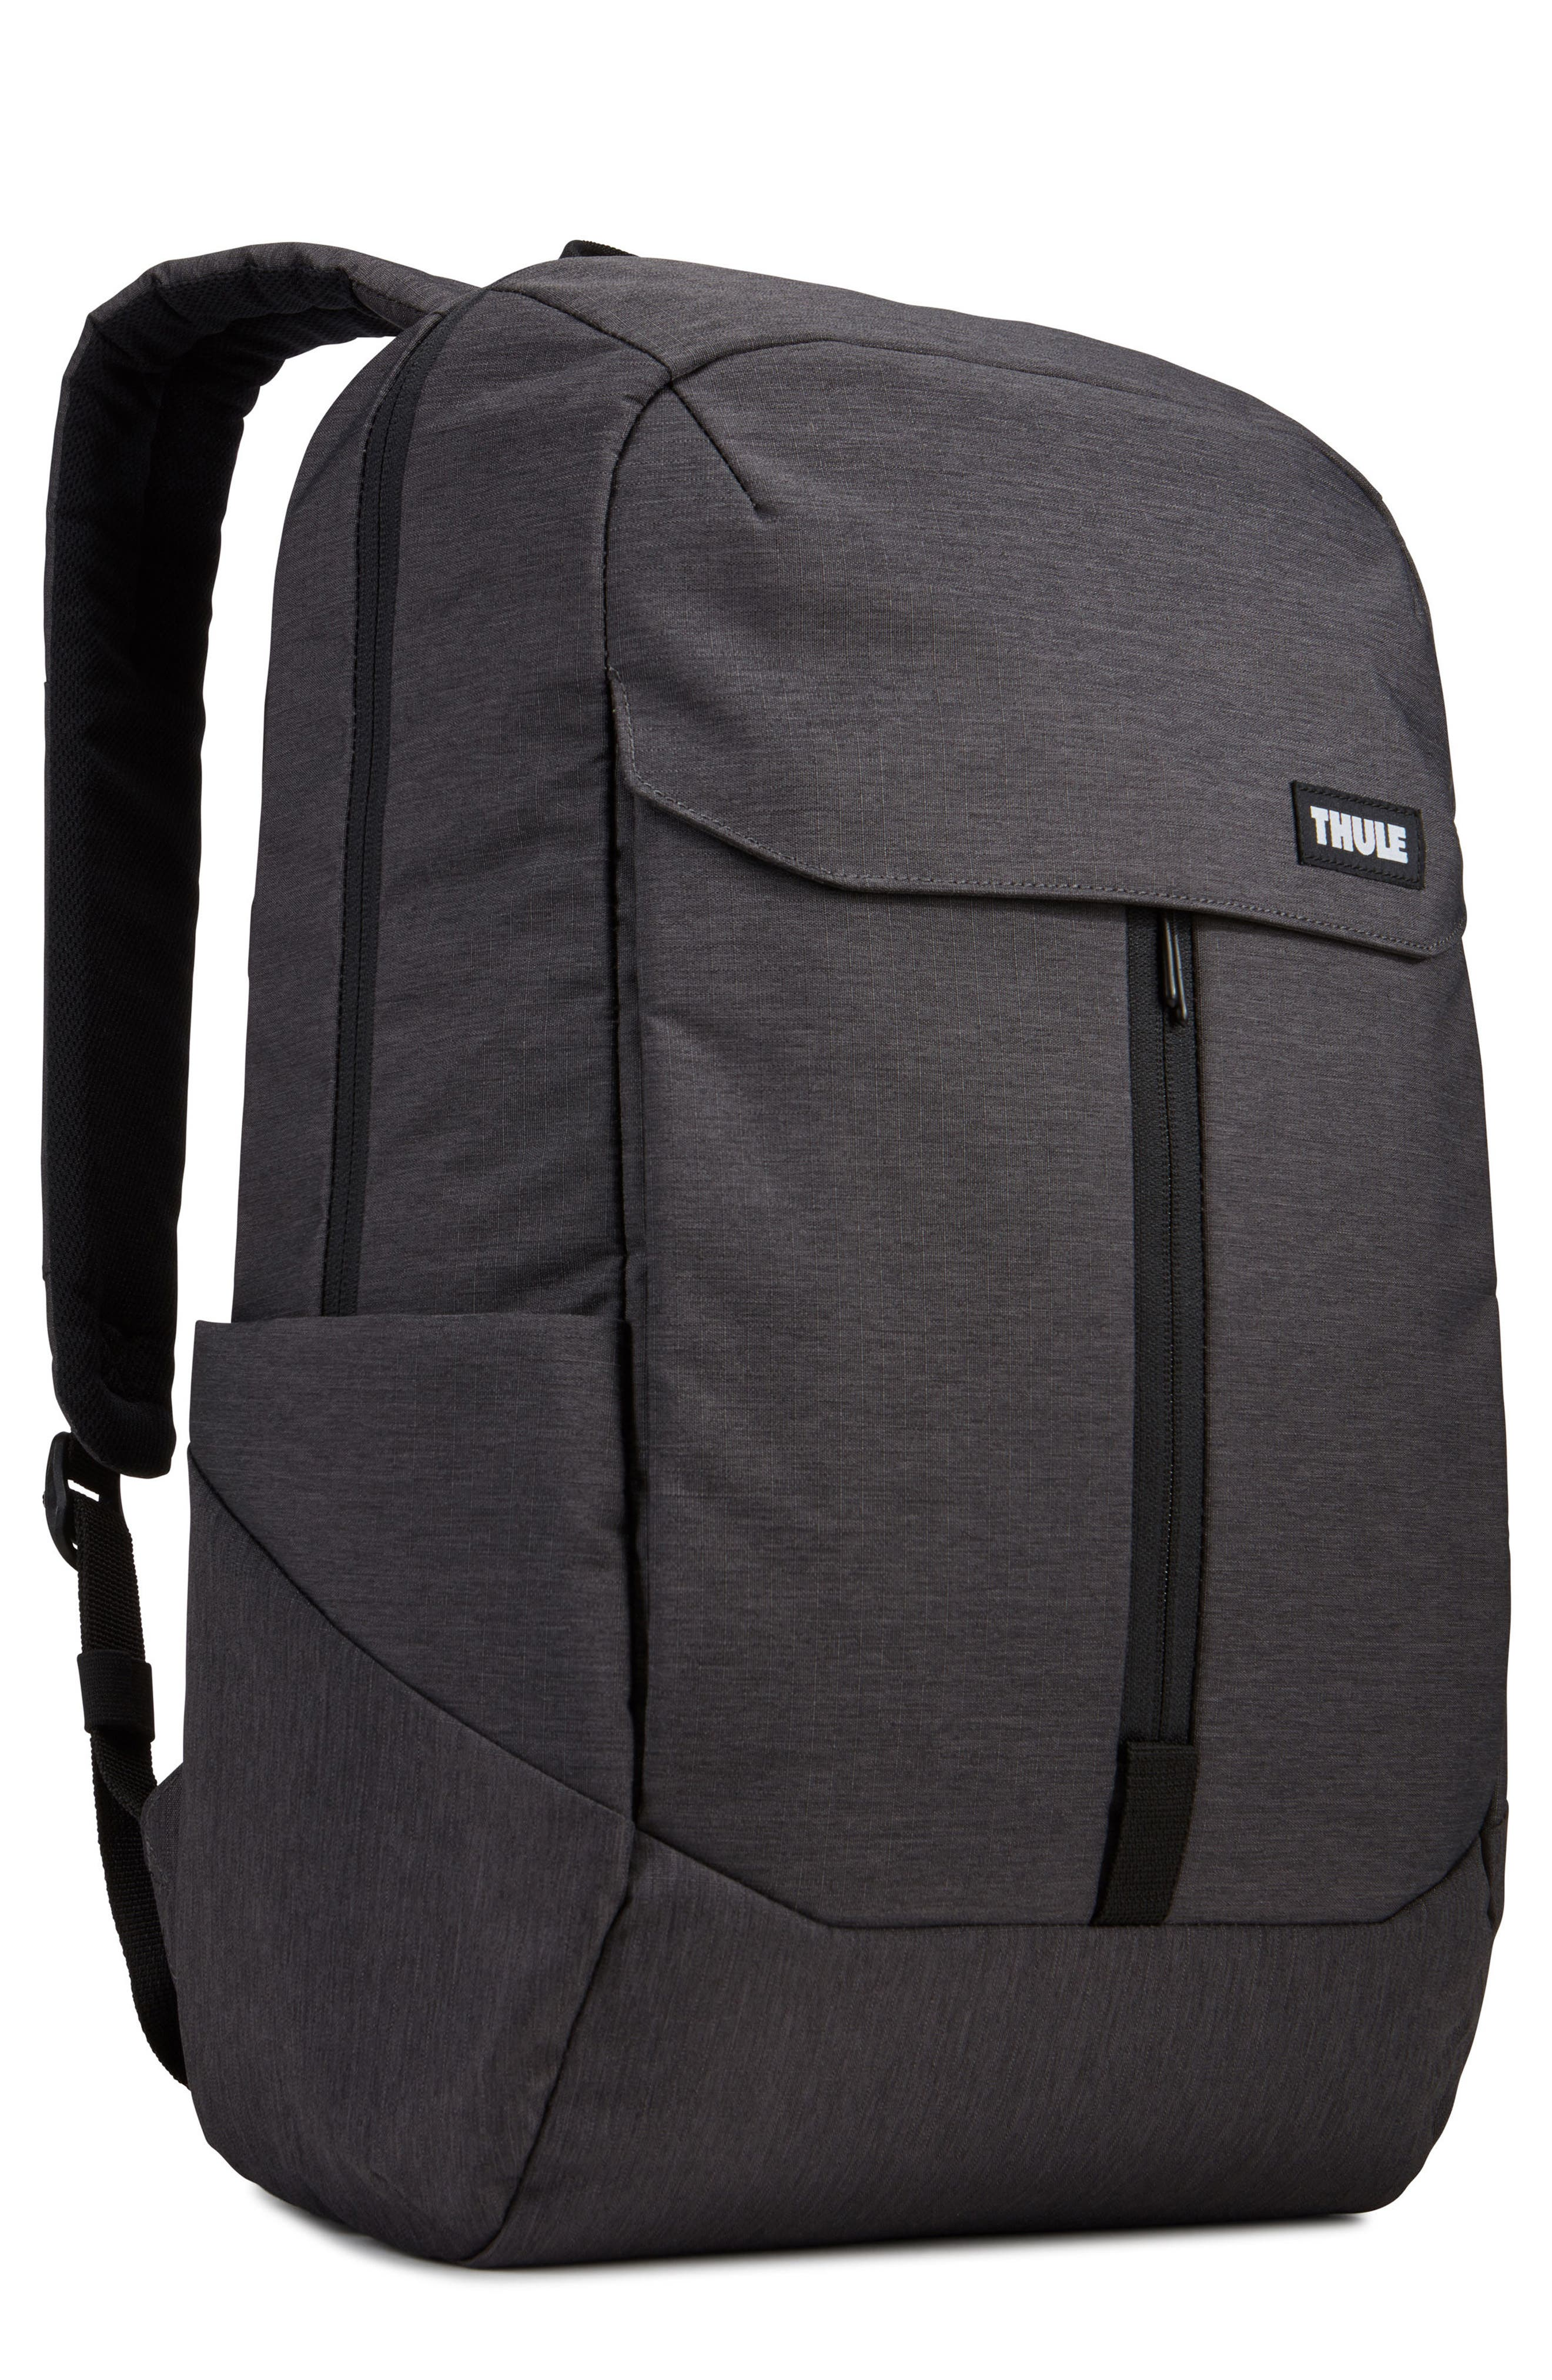 Thule Lithos Backpack (20L)